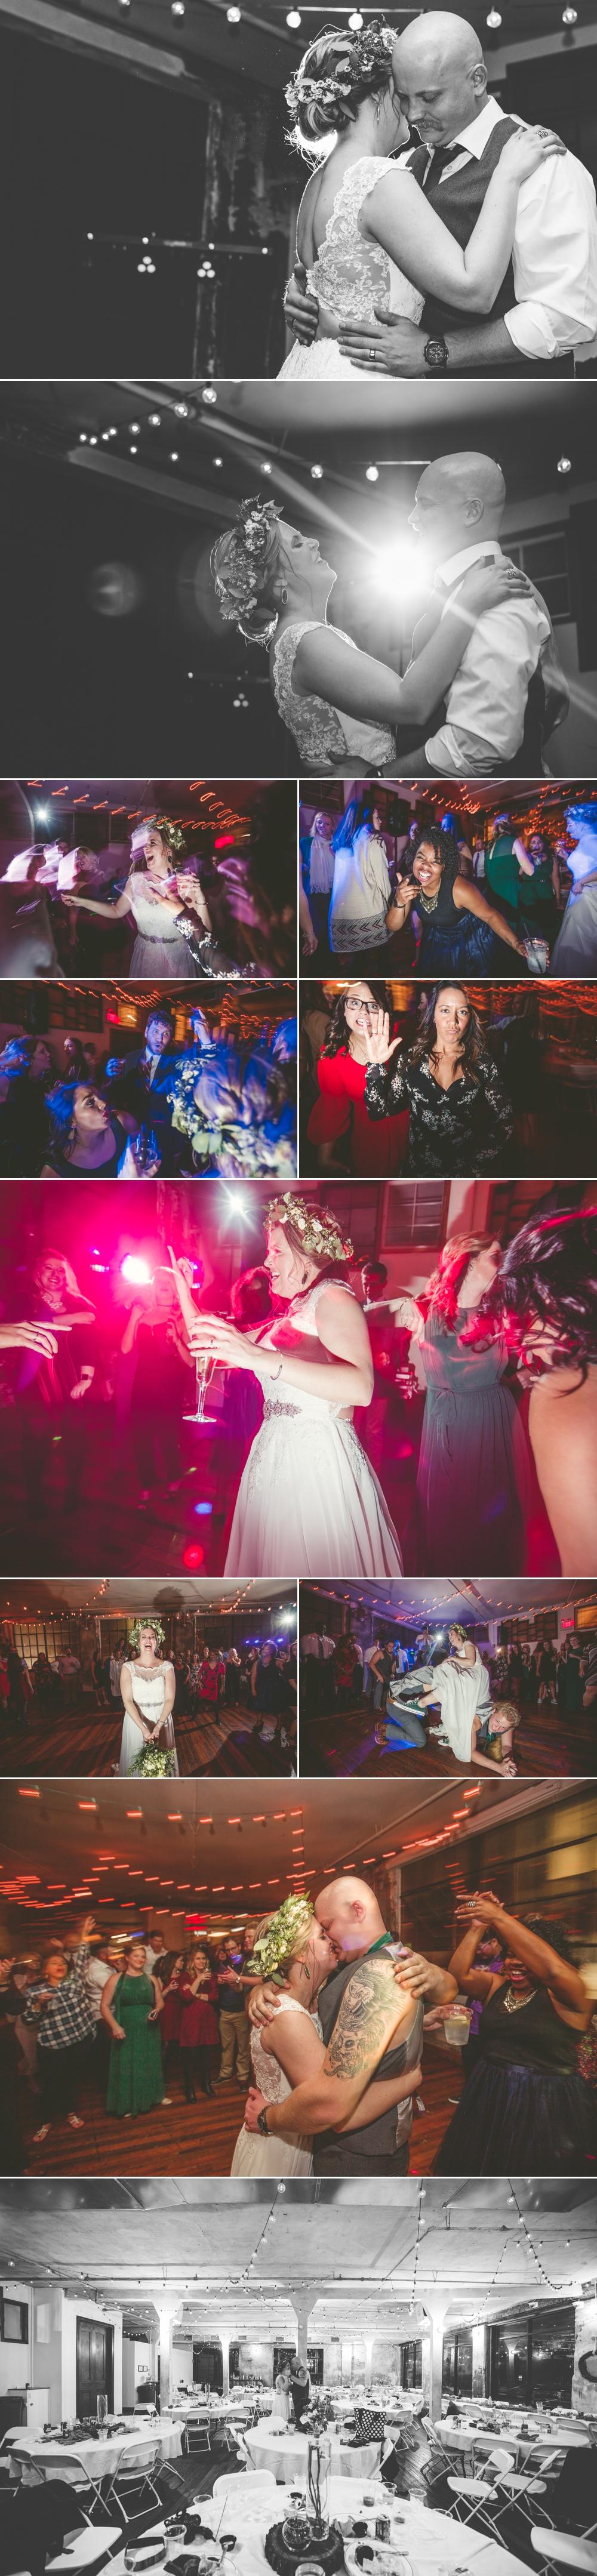 jason_domingues_photography_best_kansas_city_wedding_photographer_kc_weddings_the_bauer0003.jpg